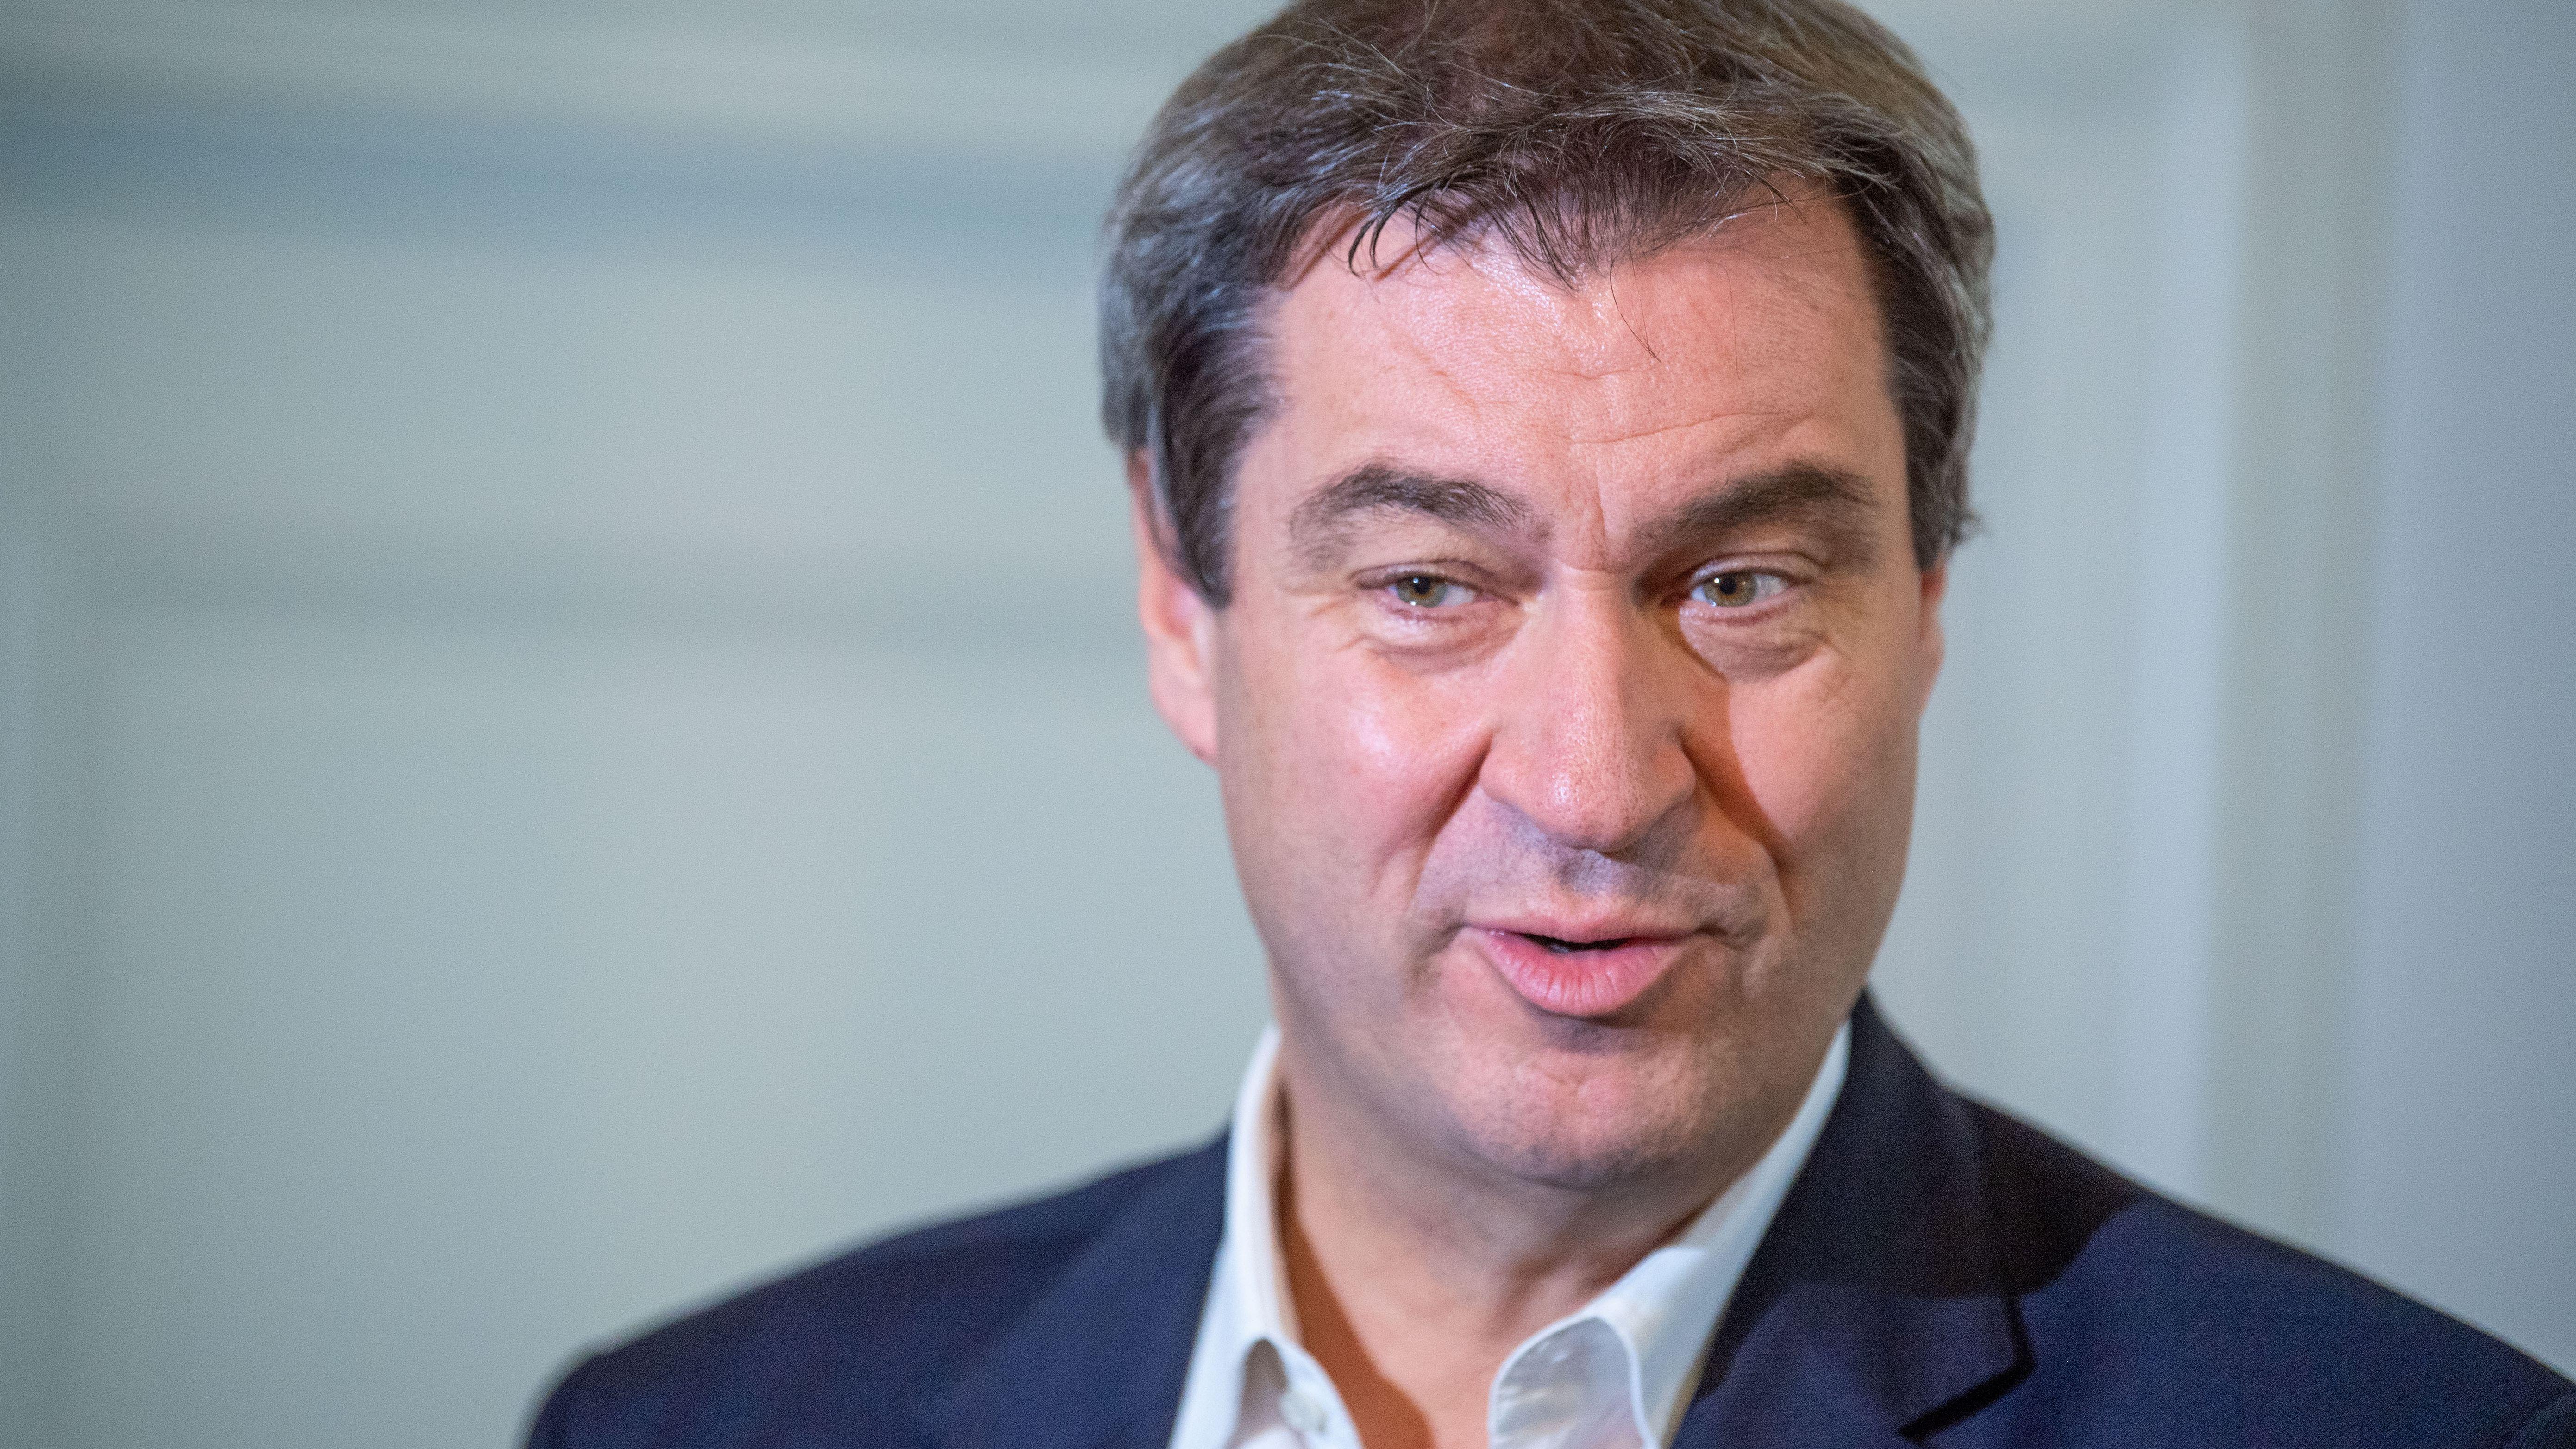 Bayerns Ministerpräsident Markus Söder